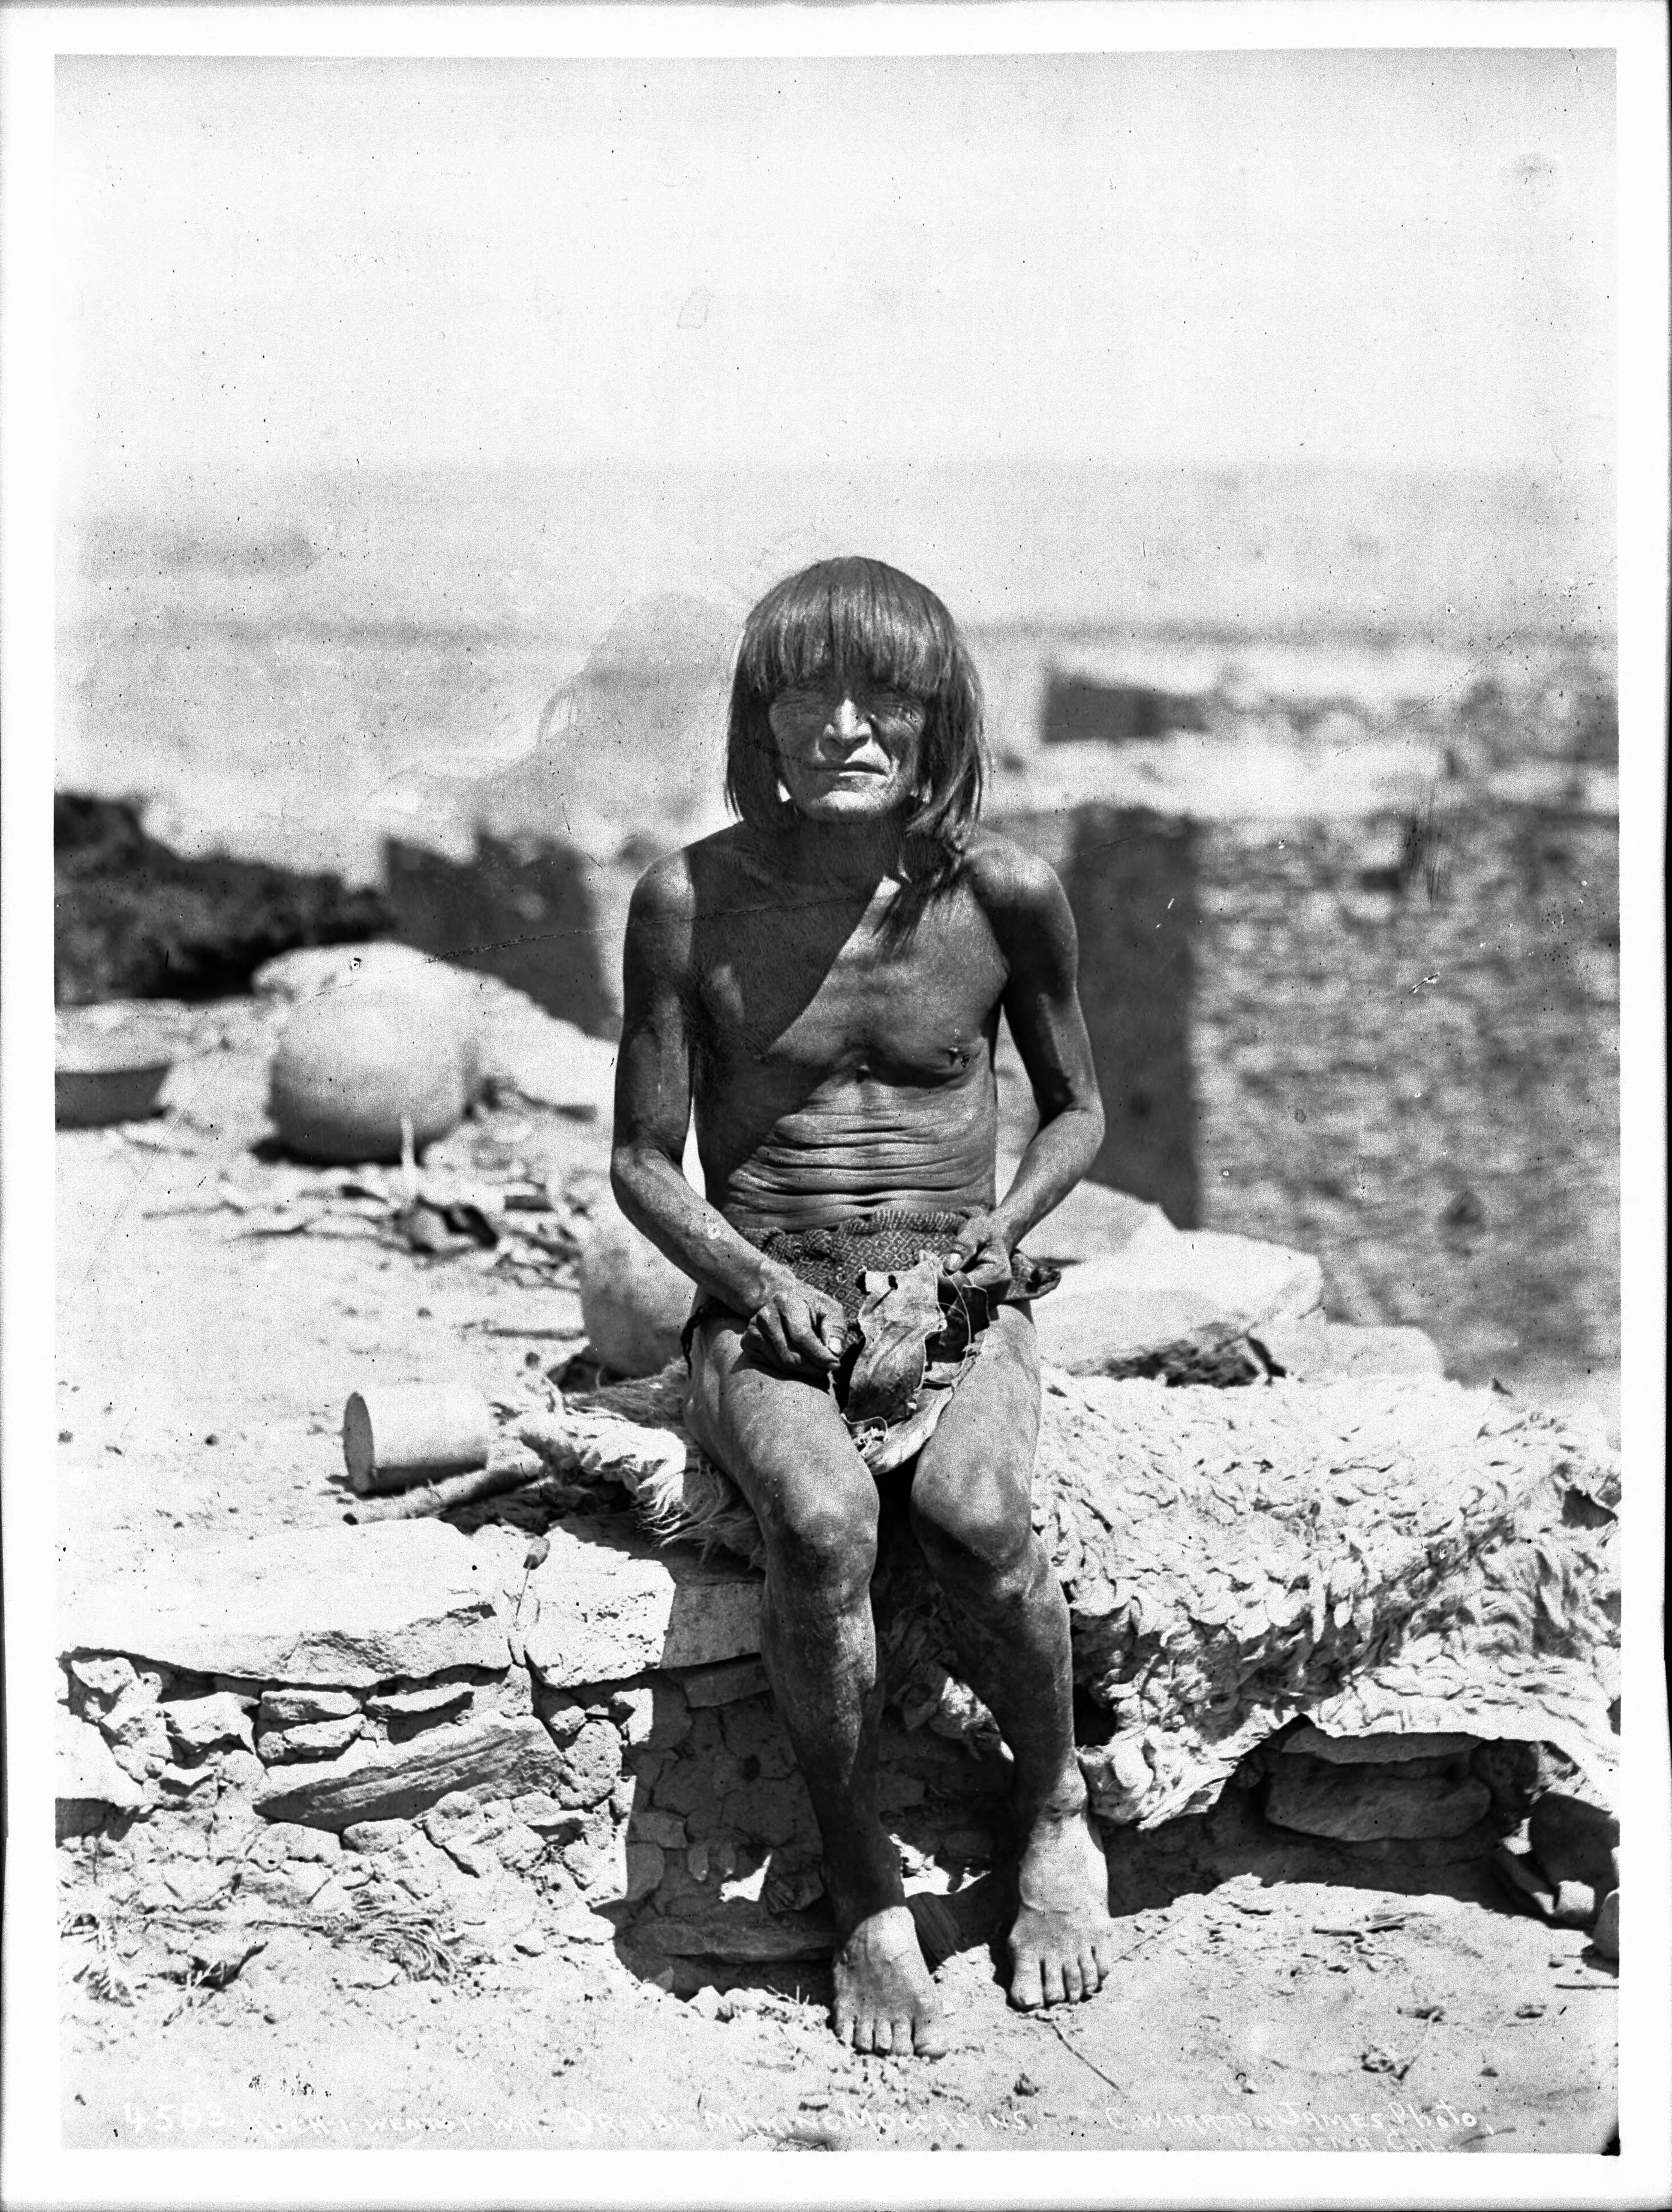 File:Koch-i-vent-i-wa, a Hopi man making